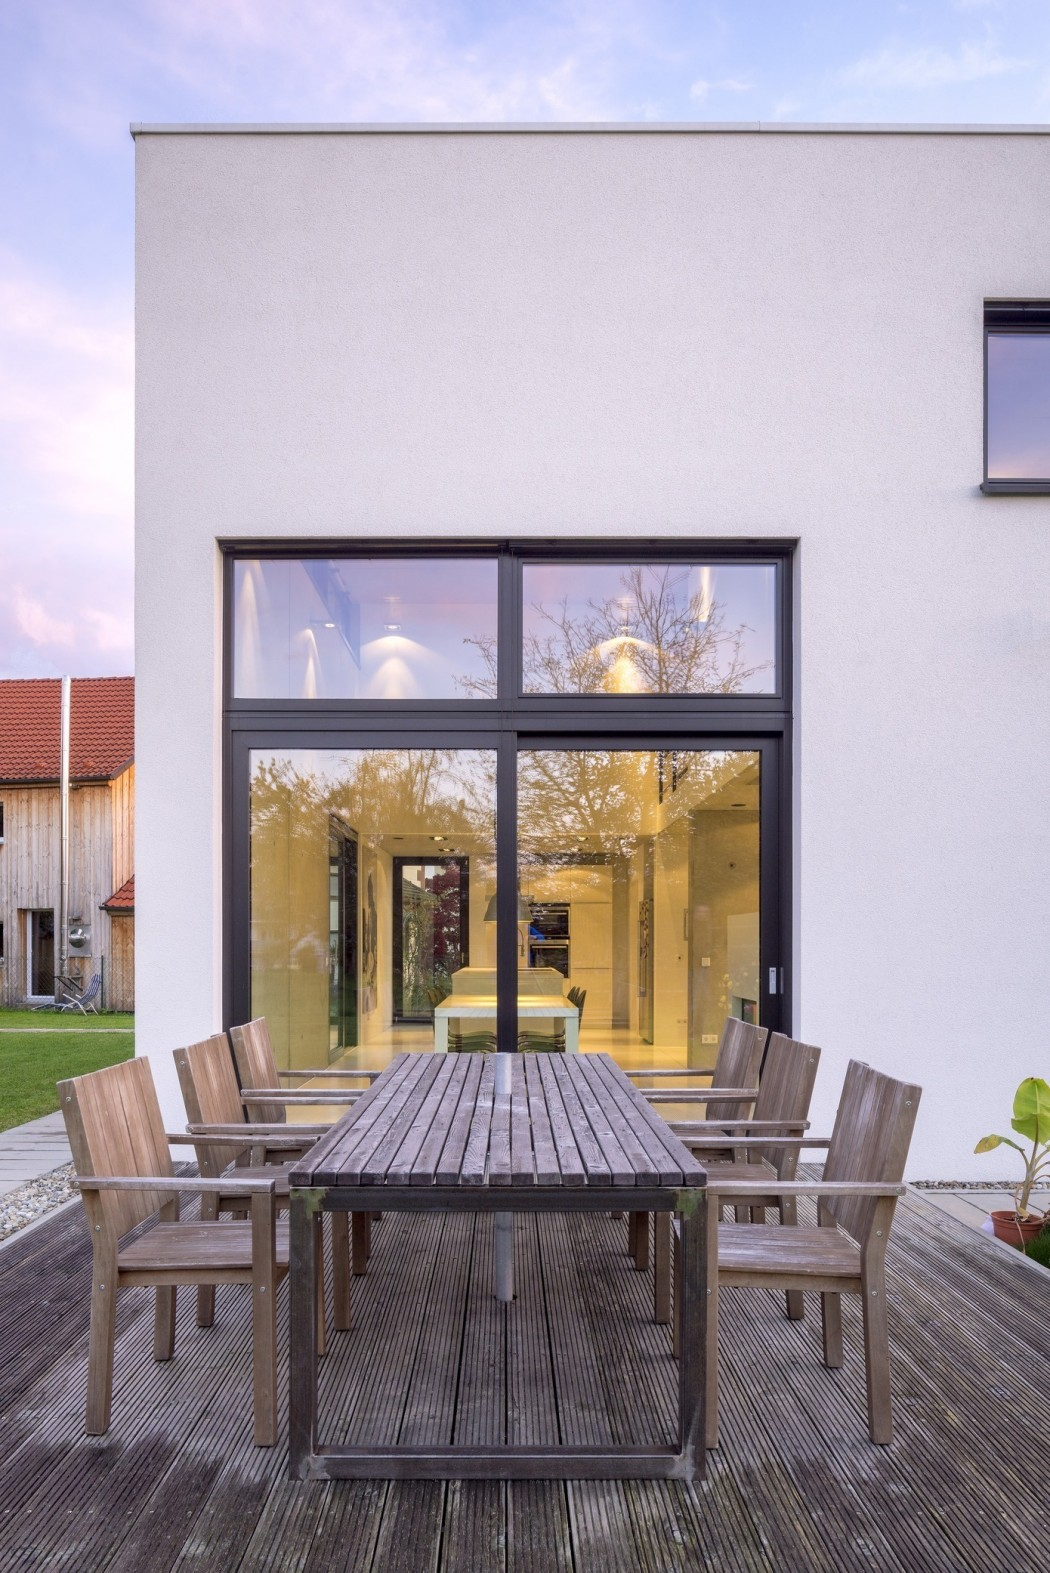 KN08 House by Schiller Architektur « HomeAdore